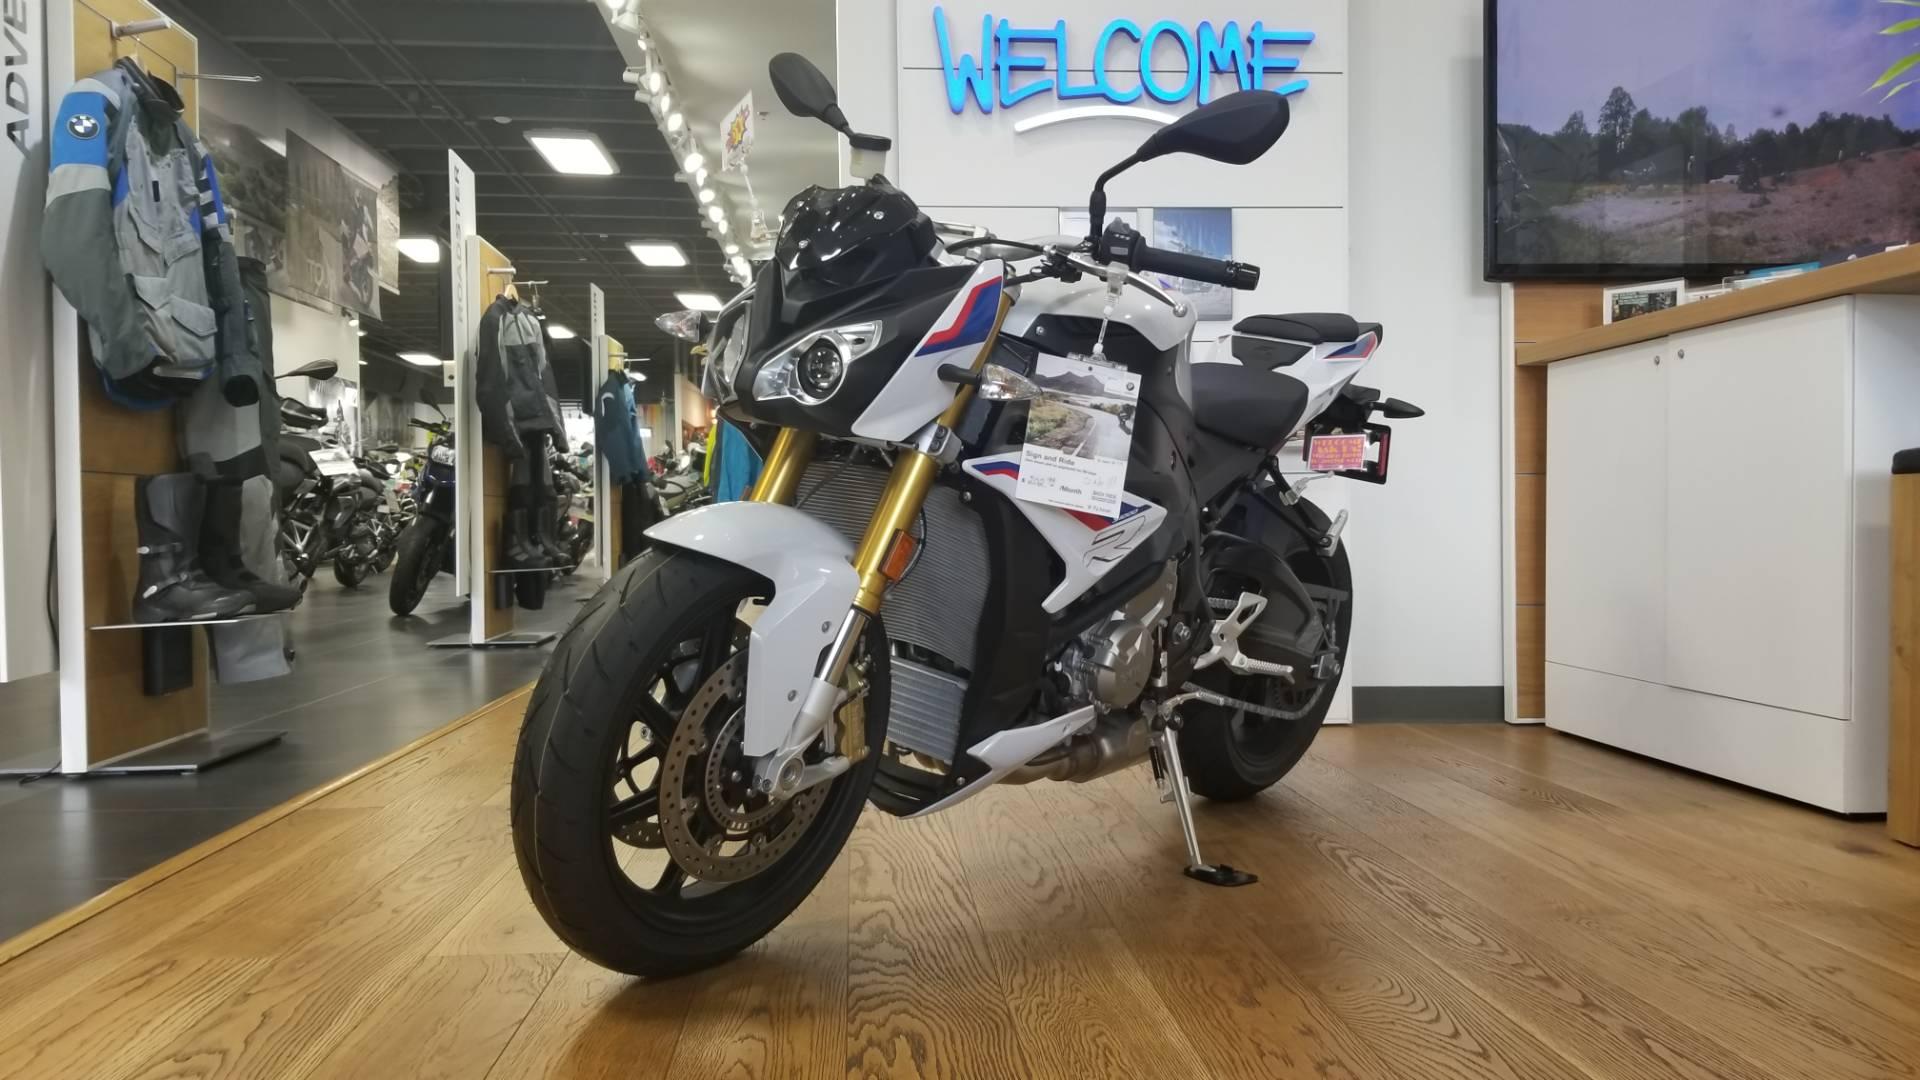 2017 S 1000 R